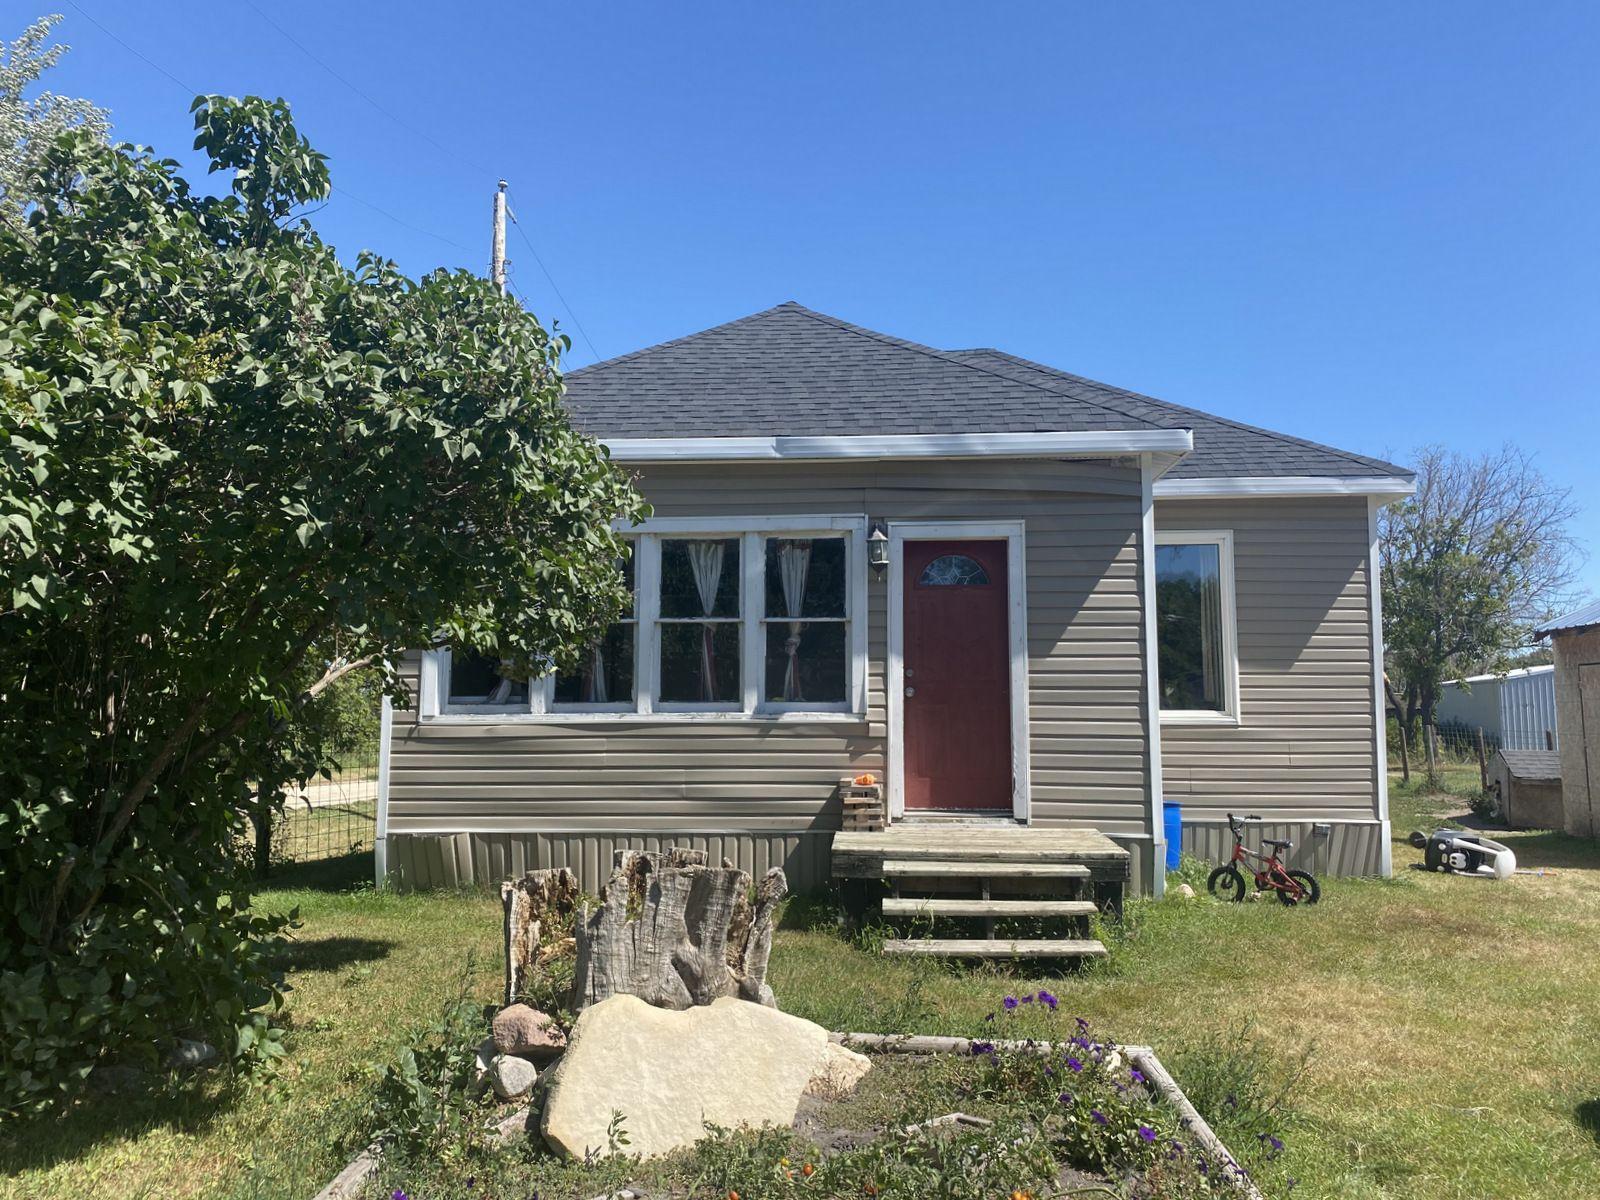 Main Photo: 65091 PR 242 Highway in Bagot: House for sale : MLS®# 202011564